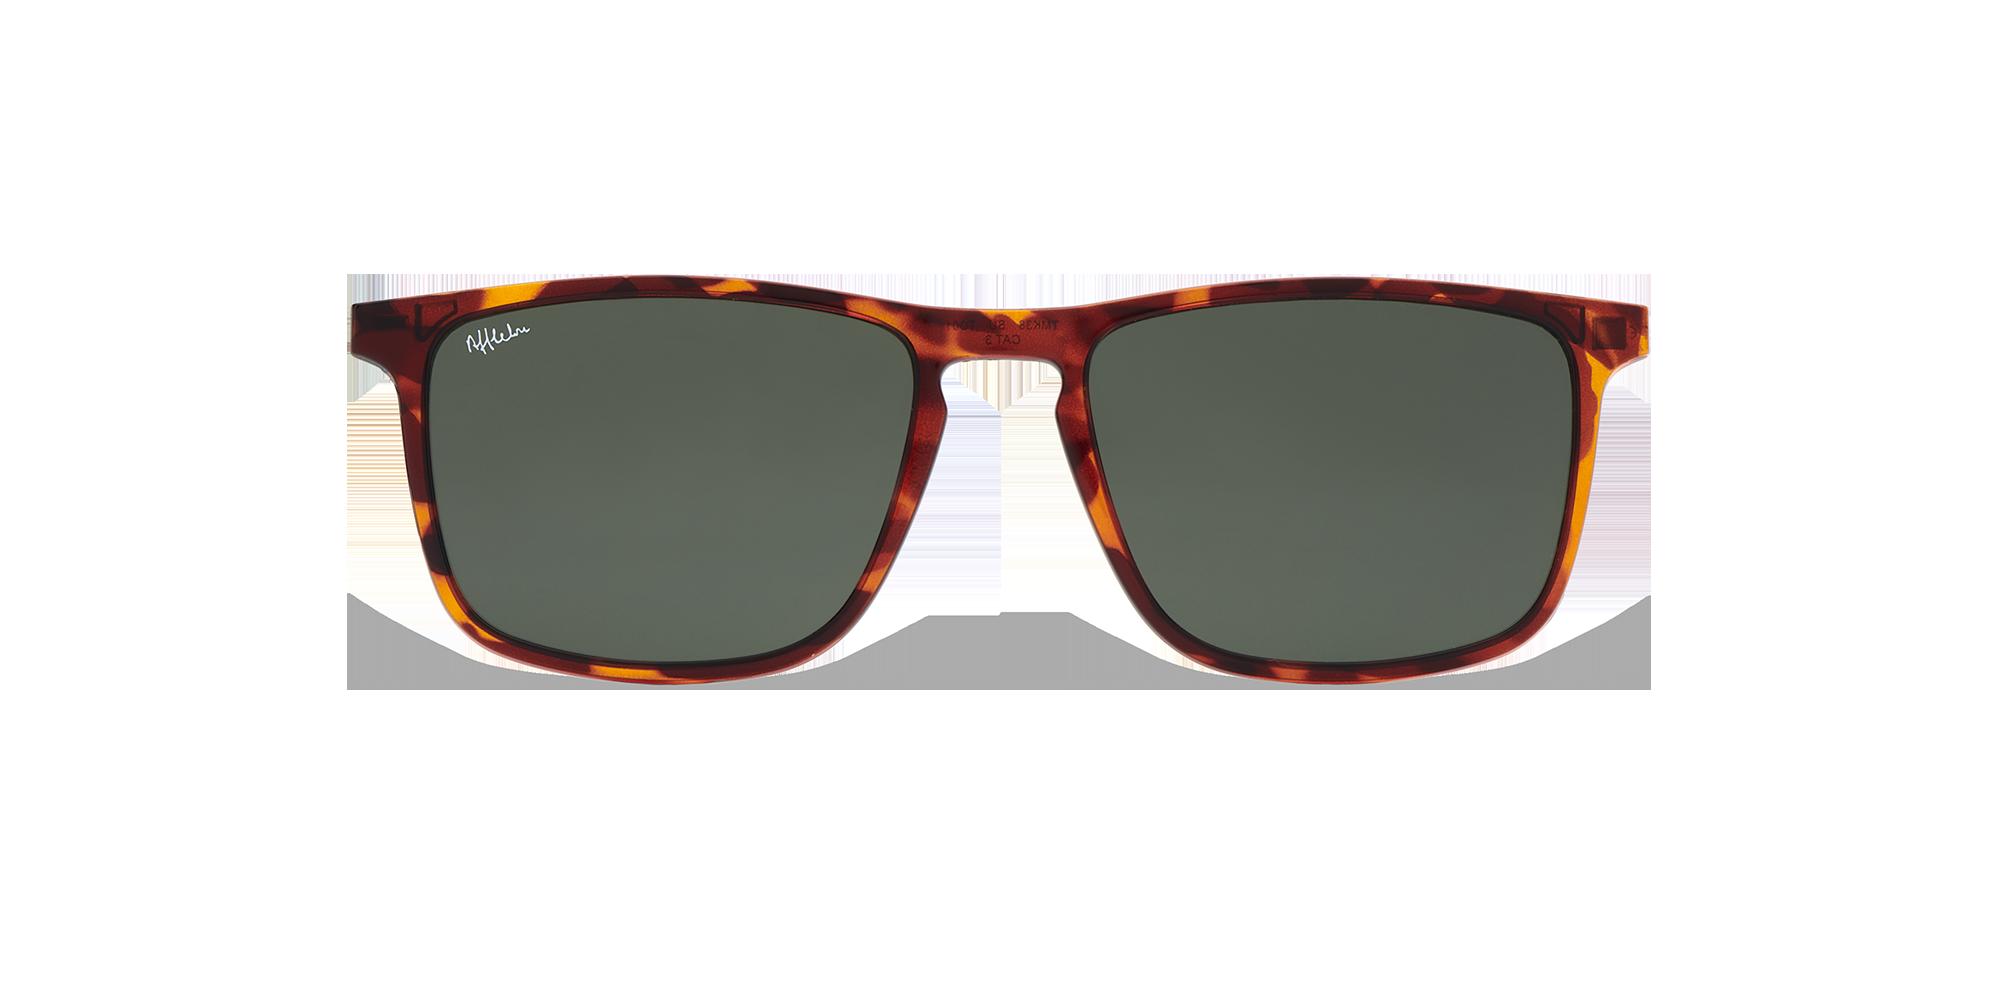 afflelou/france/products/smart_clip/clips_glasses/07630036428733_face.png